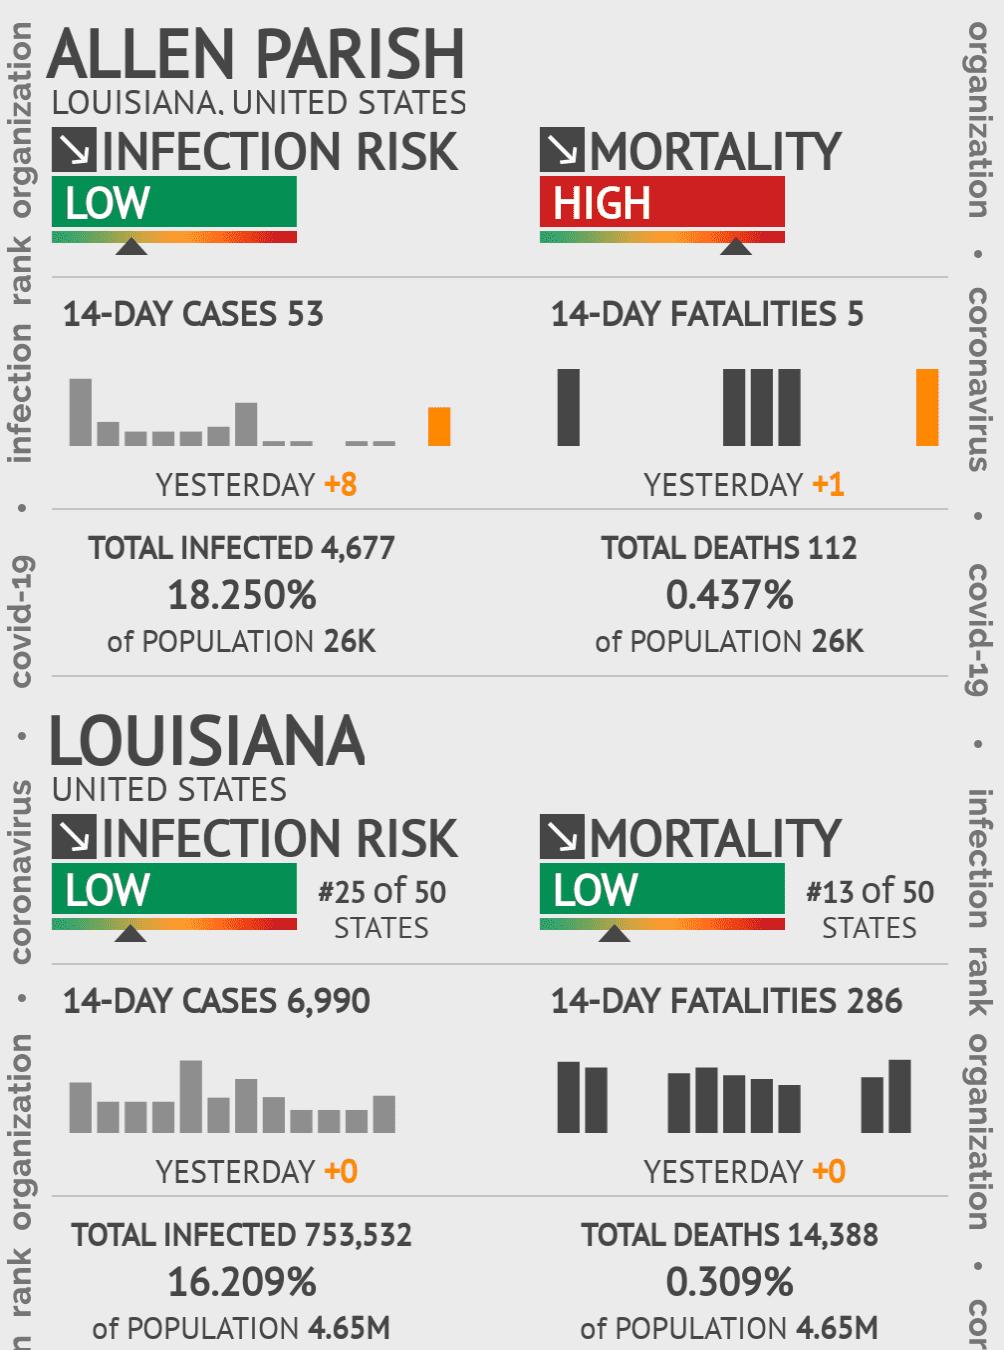 Allen Parish Coronavirus Covid-19 Risk of Infection on February 27, 2021